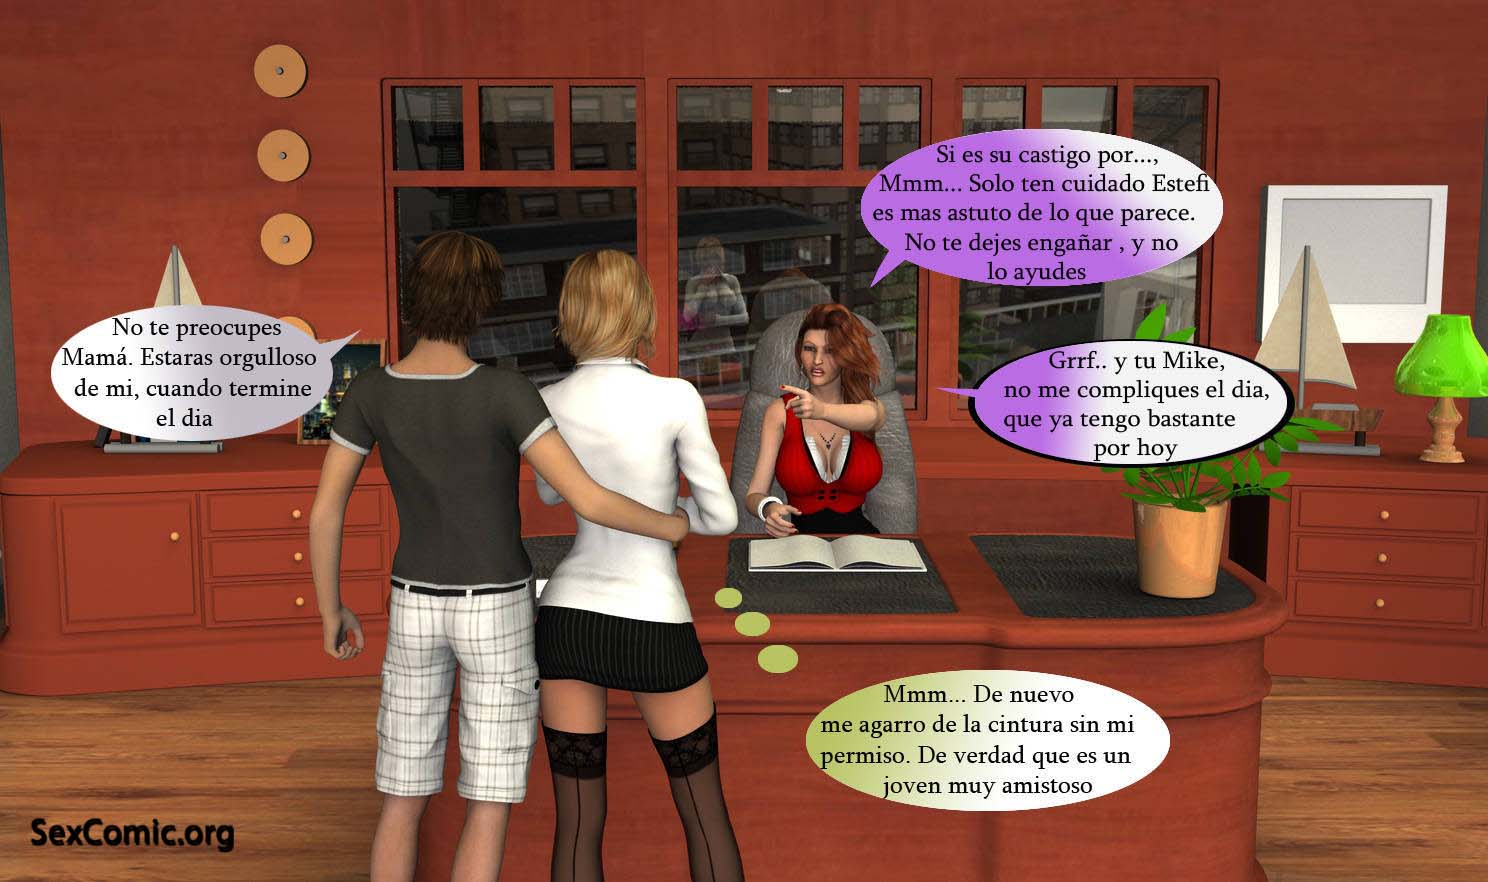 comic-xxx-3d-seduciendo-alas-empleadas-de-mama-historias-sexuales-mangas-para-adultos-videos-deincesto-comics-xxx-historias-eroticas-fantacias-sexuales-gtaris-online-25